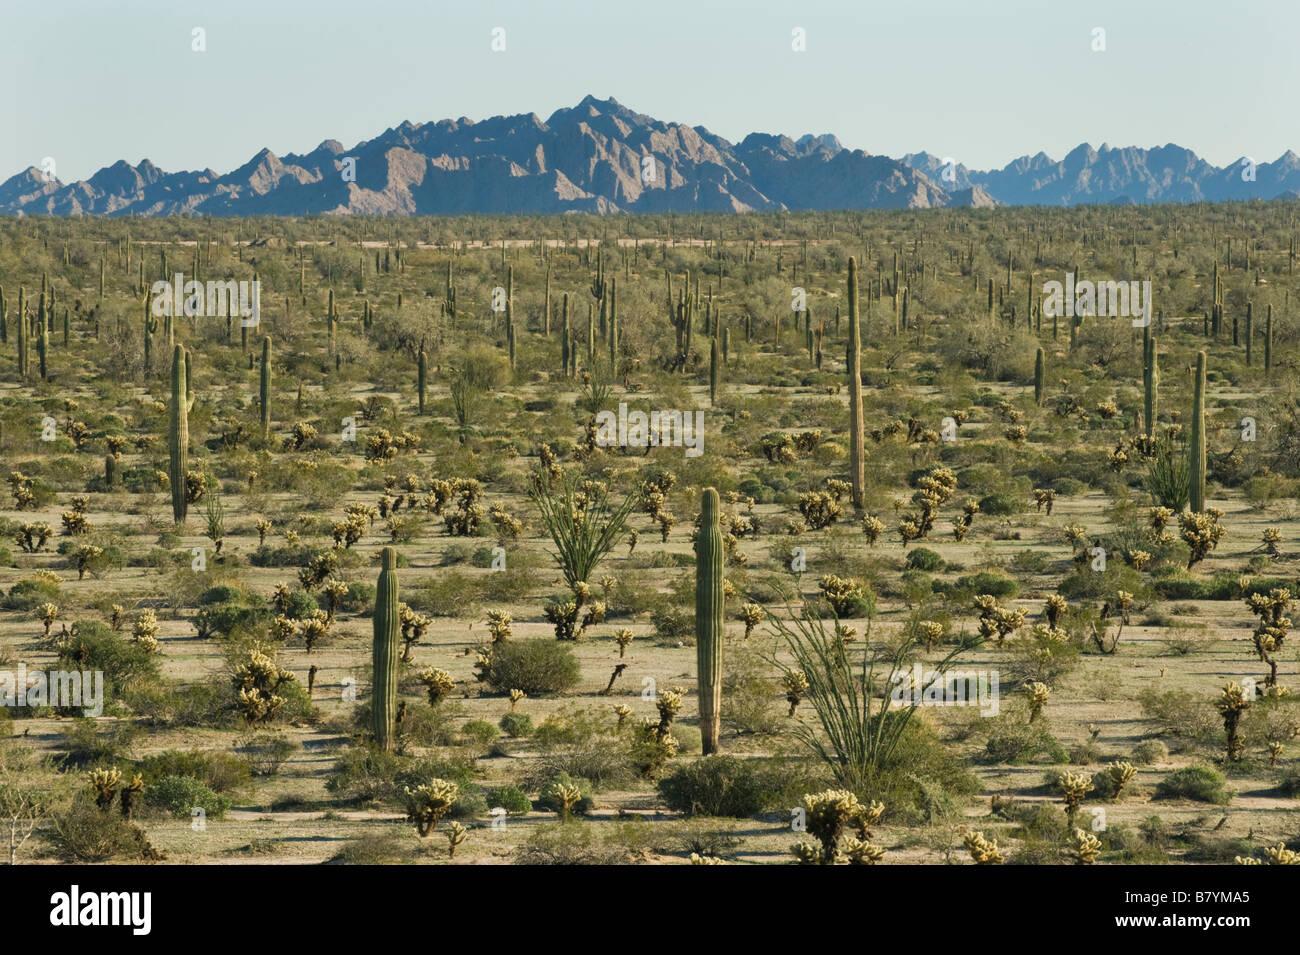 Sonoran Desert, Tinajas Altas Mountains, Barry Goldwater Air Force Range,  Arizona - Stock Image